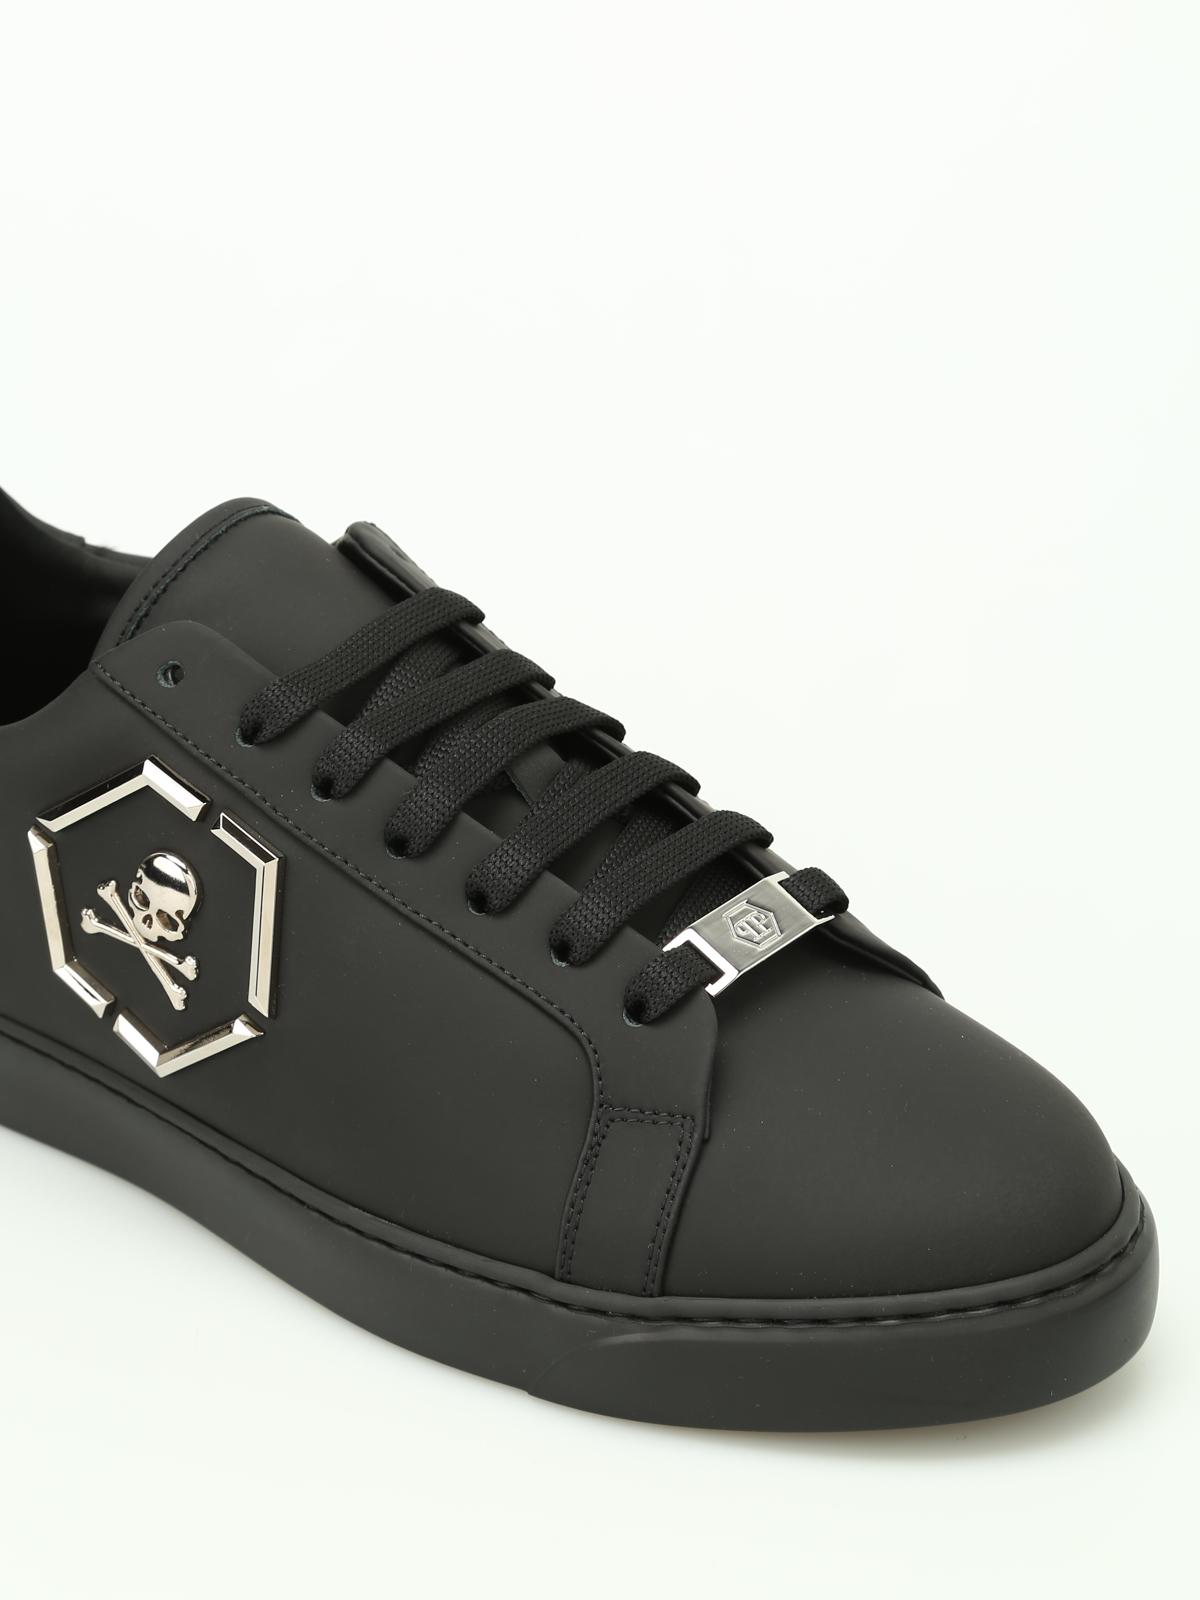 sale free shipping 100% original Philipp Plein Simpson sneakers PVxdvDtvg0